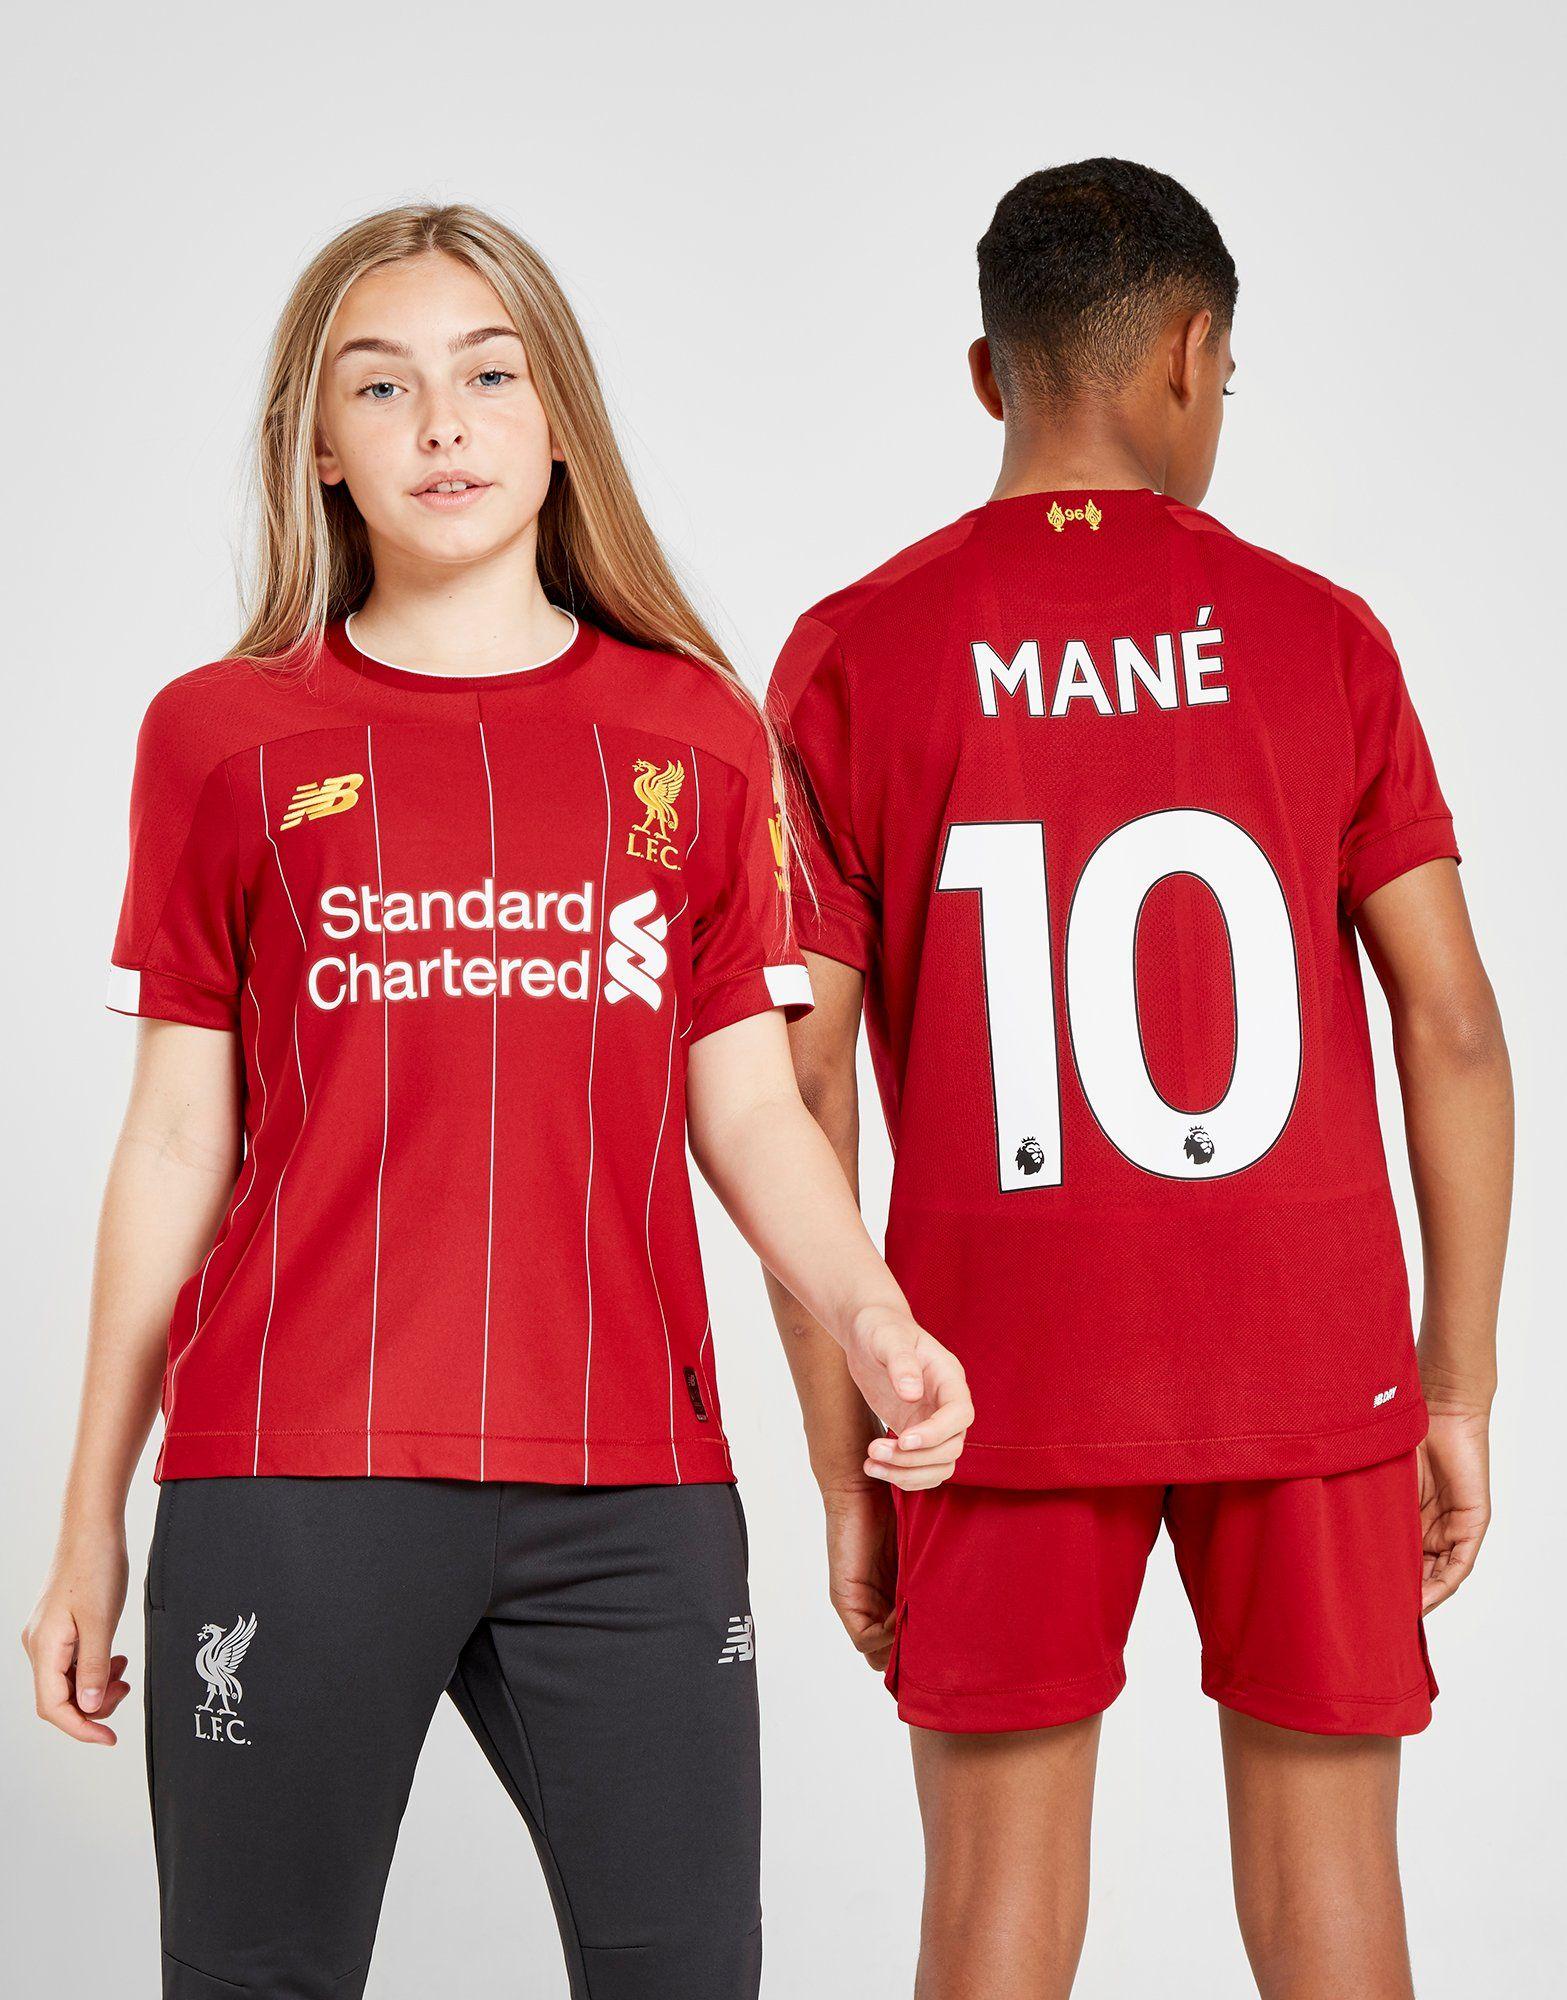 buy online 359ec 64fe5 New Balance Liverpool FC 2019/20 Mane #10 Home Shirt Junior | JD Sports  Ireland